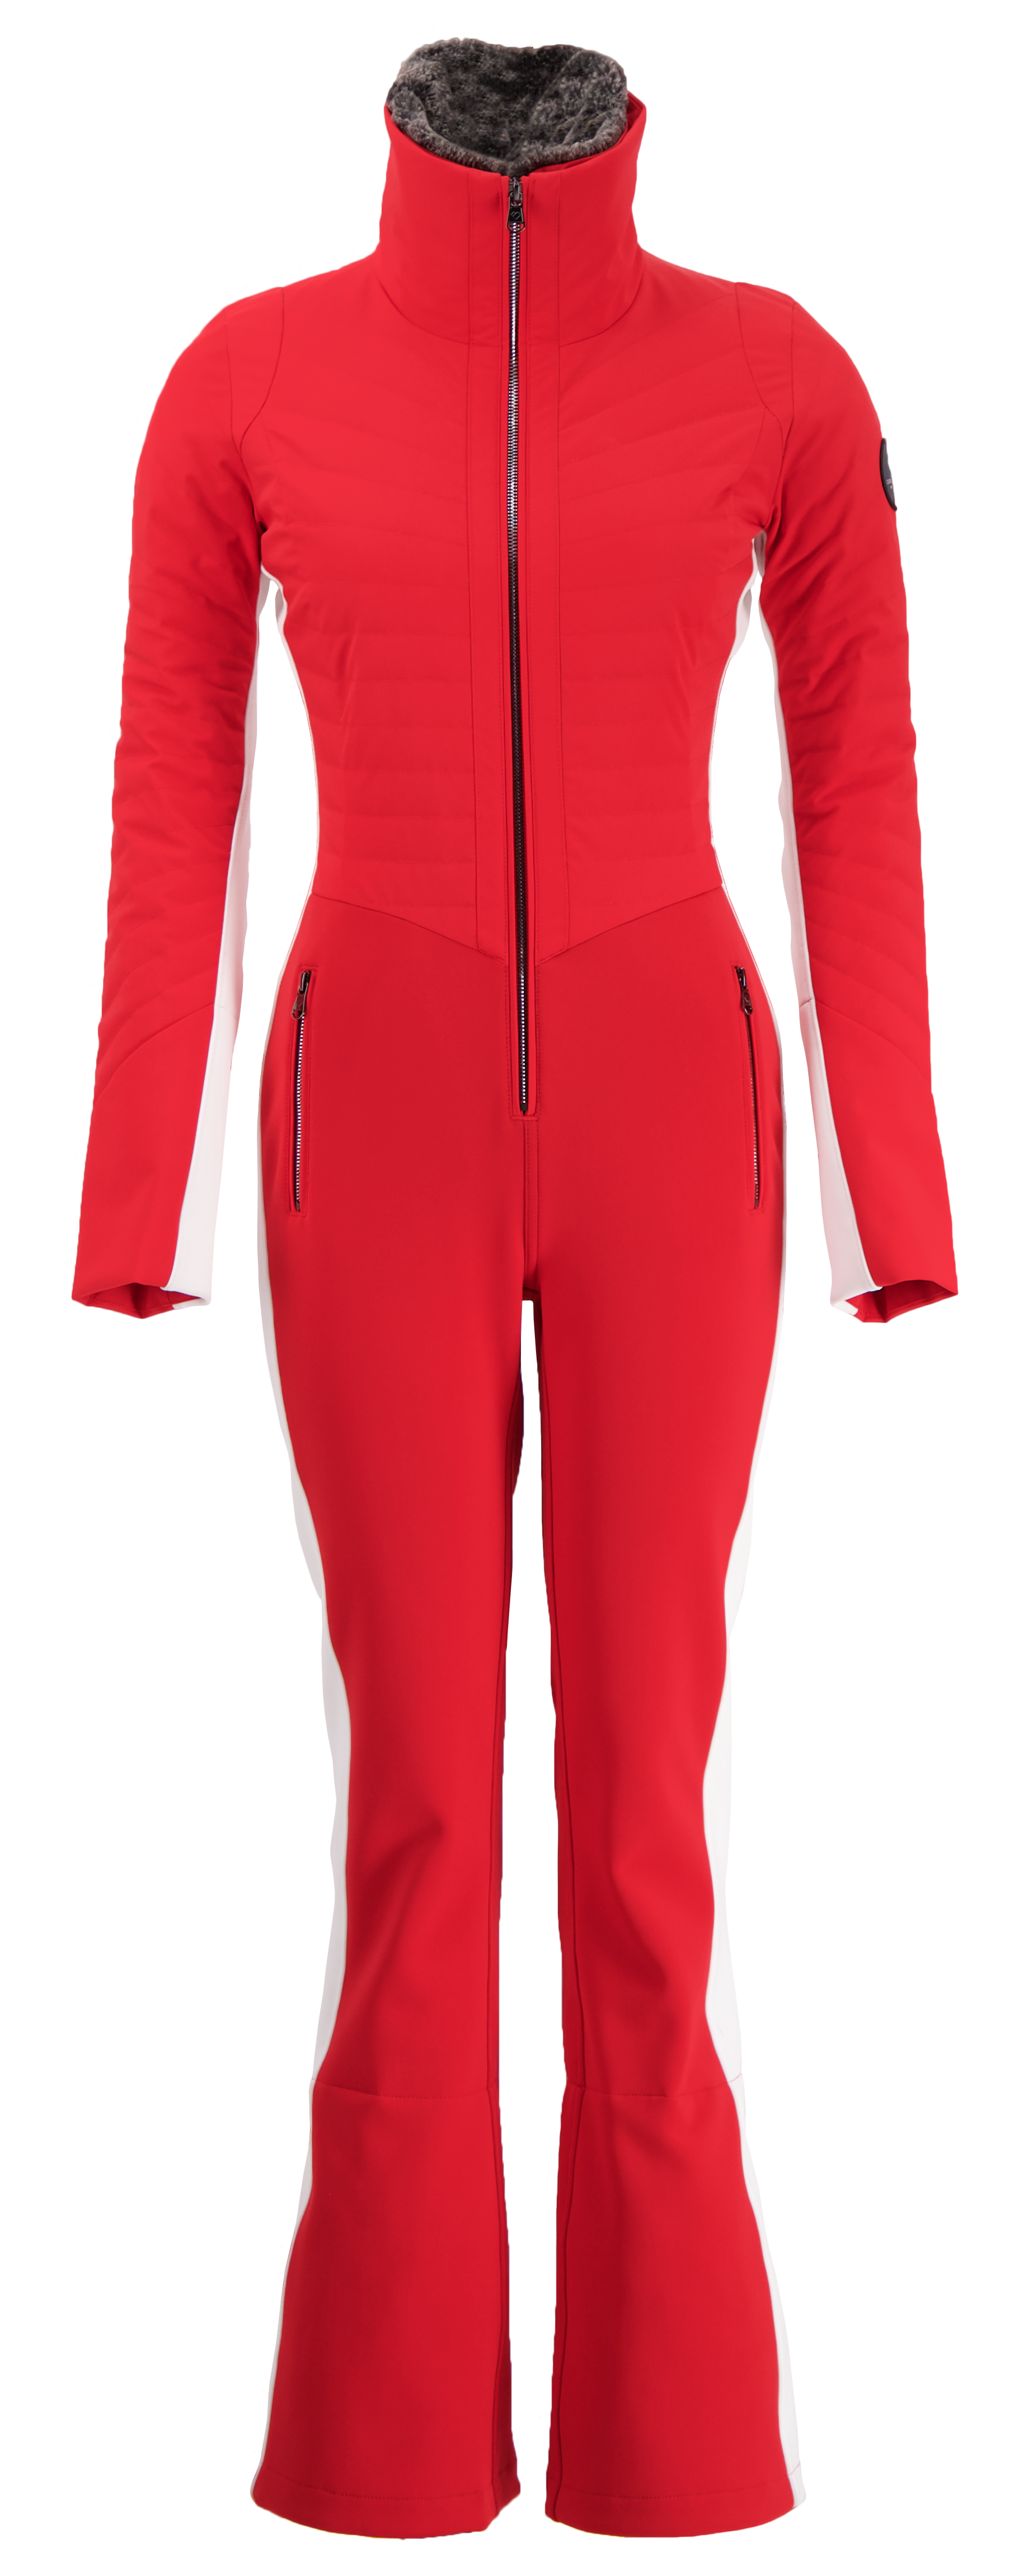 2016 Nordica NRGy 100